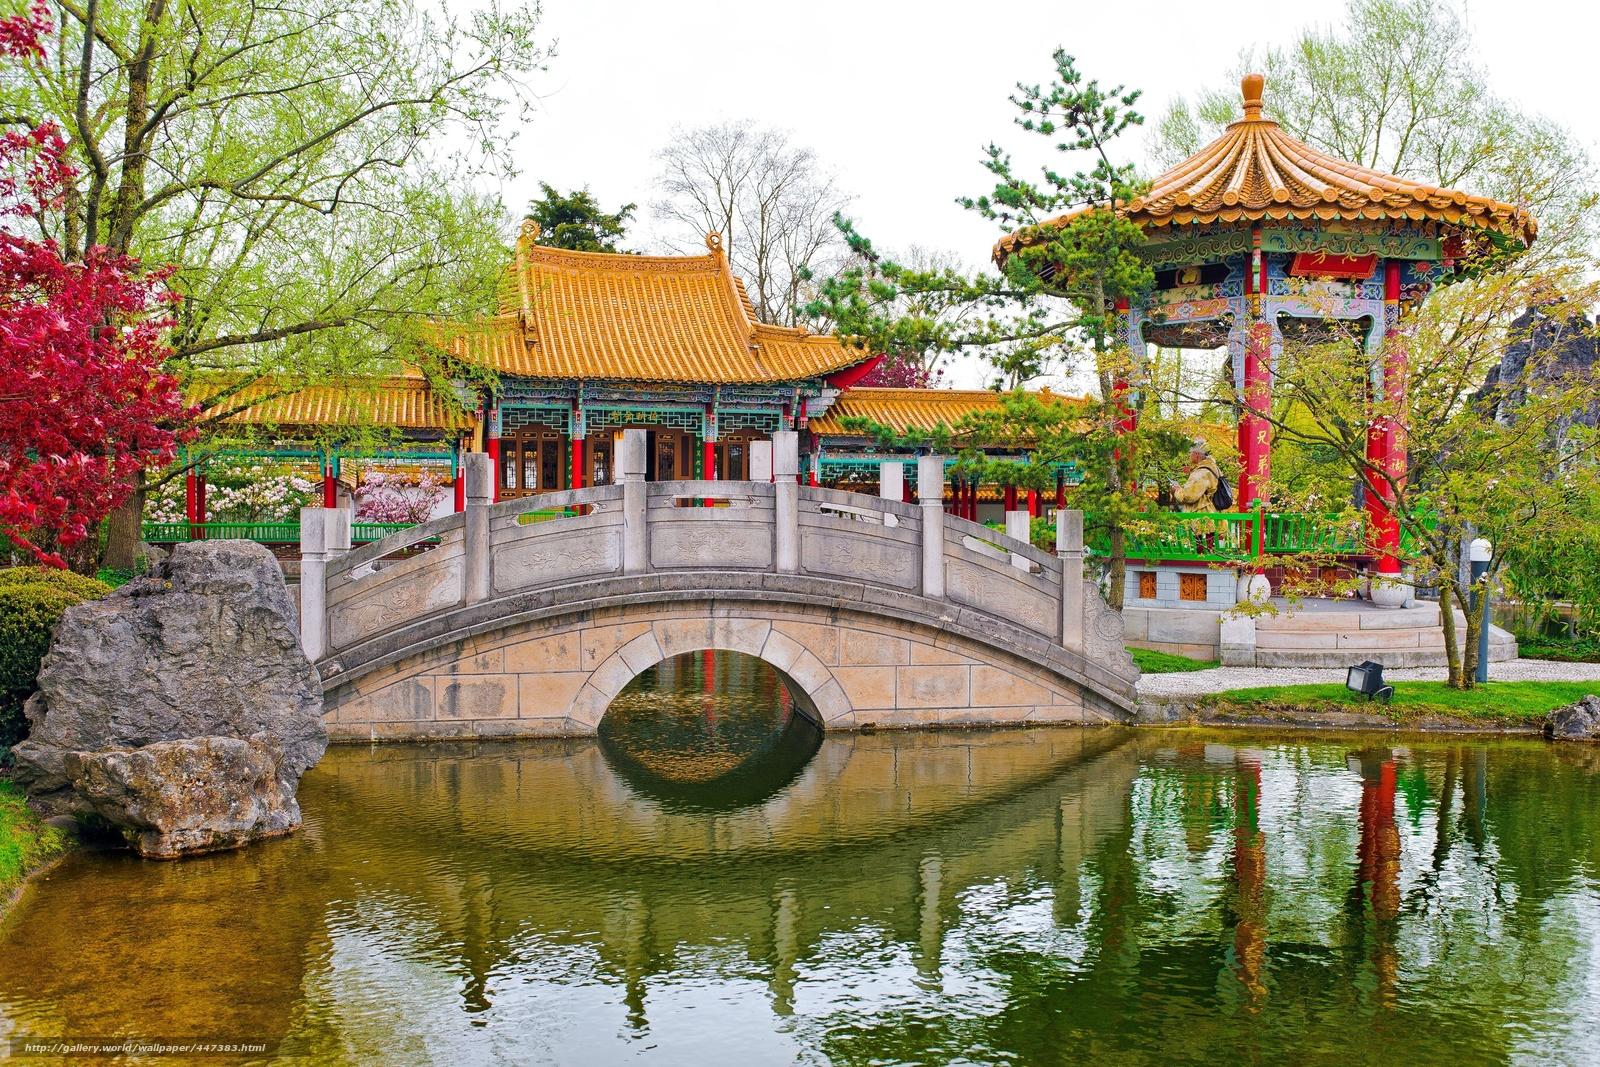 Tlcharger fond d 39 ecran jardin chinois suisse suisse for Jardin chinois